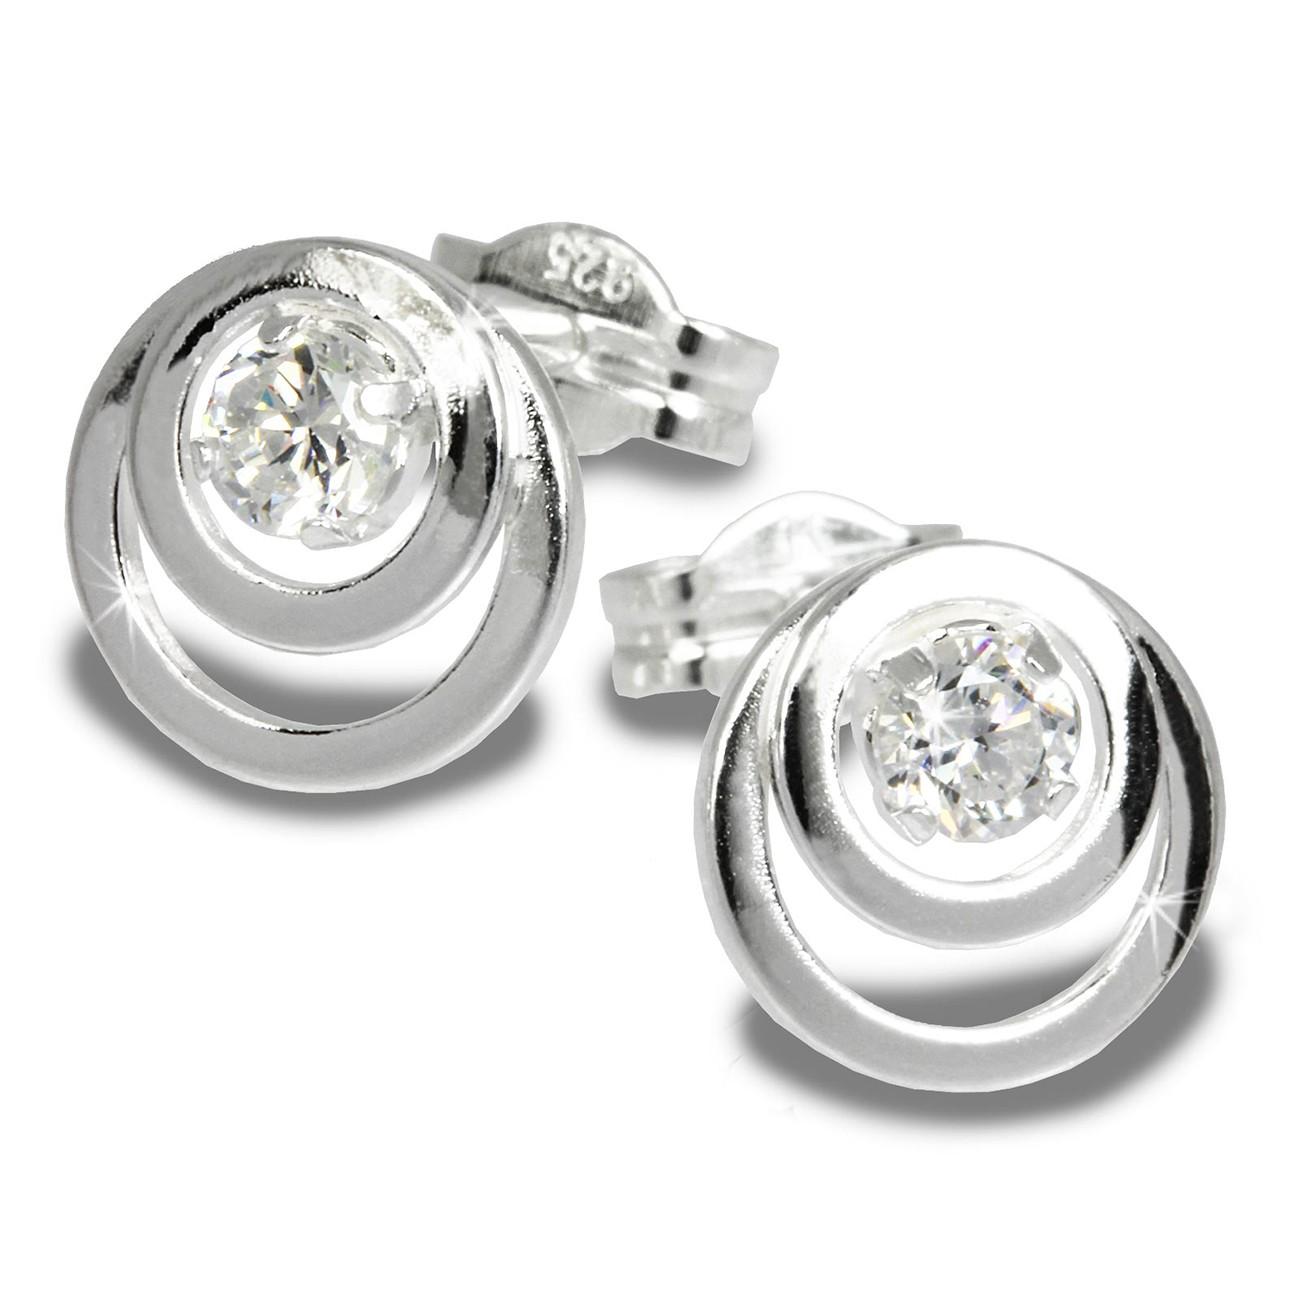 SilberDream Ohrring Kreise Zirkonia weiß 925 Silber Ohrstecker SDO542W